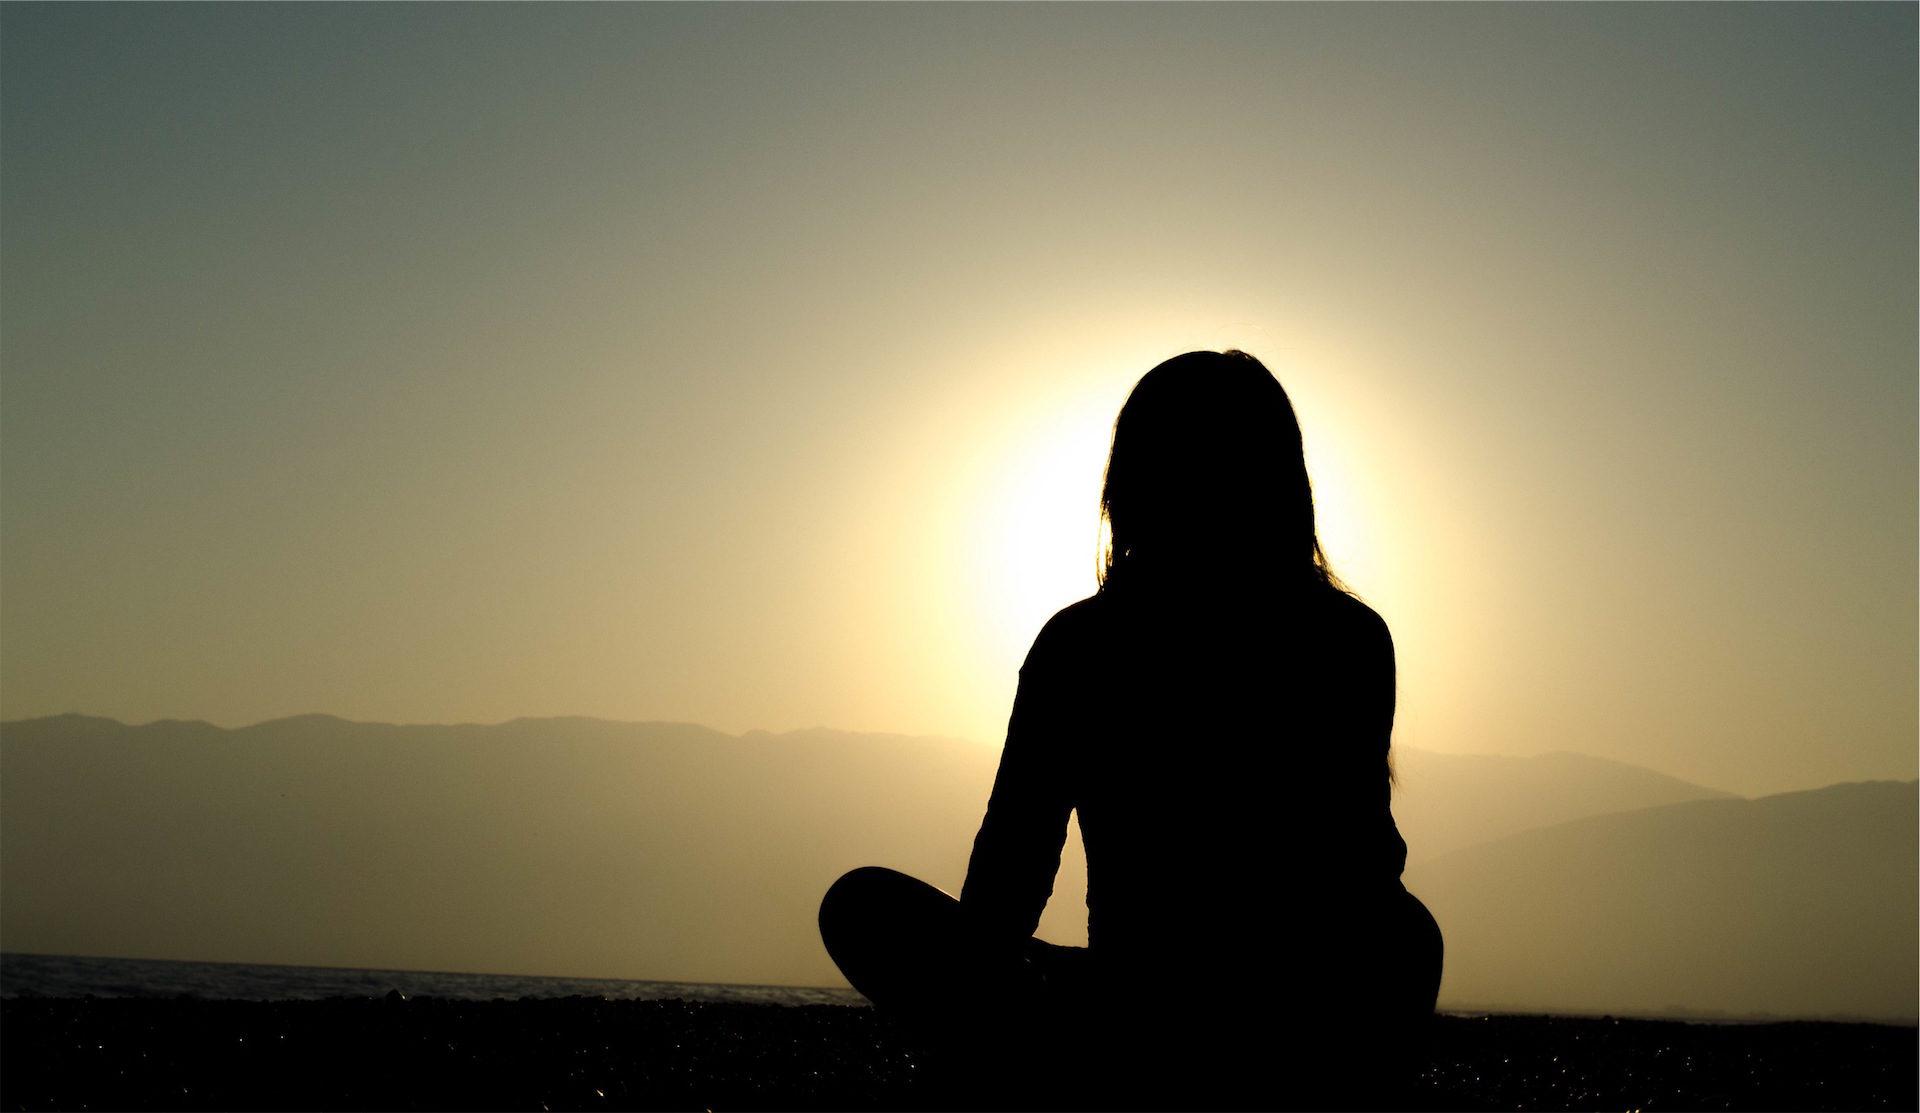 femme, méditation, Yoga, Sun, Nirvana - Fonds d'écran HD - Professor-falken.com